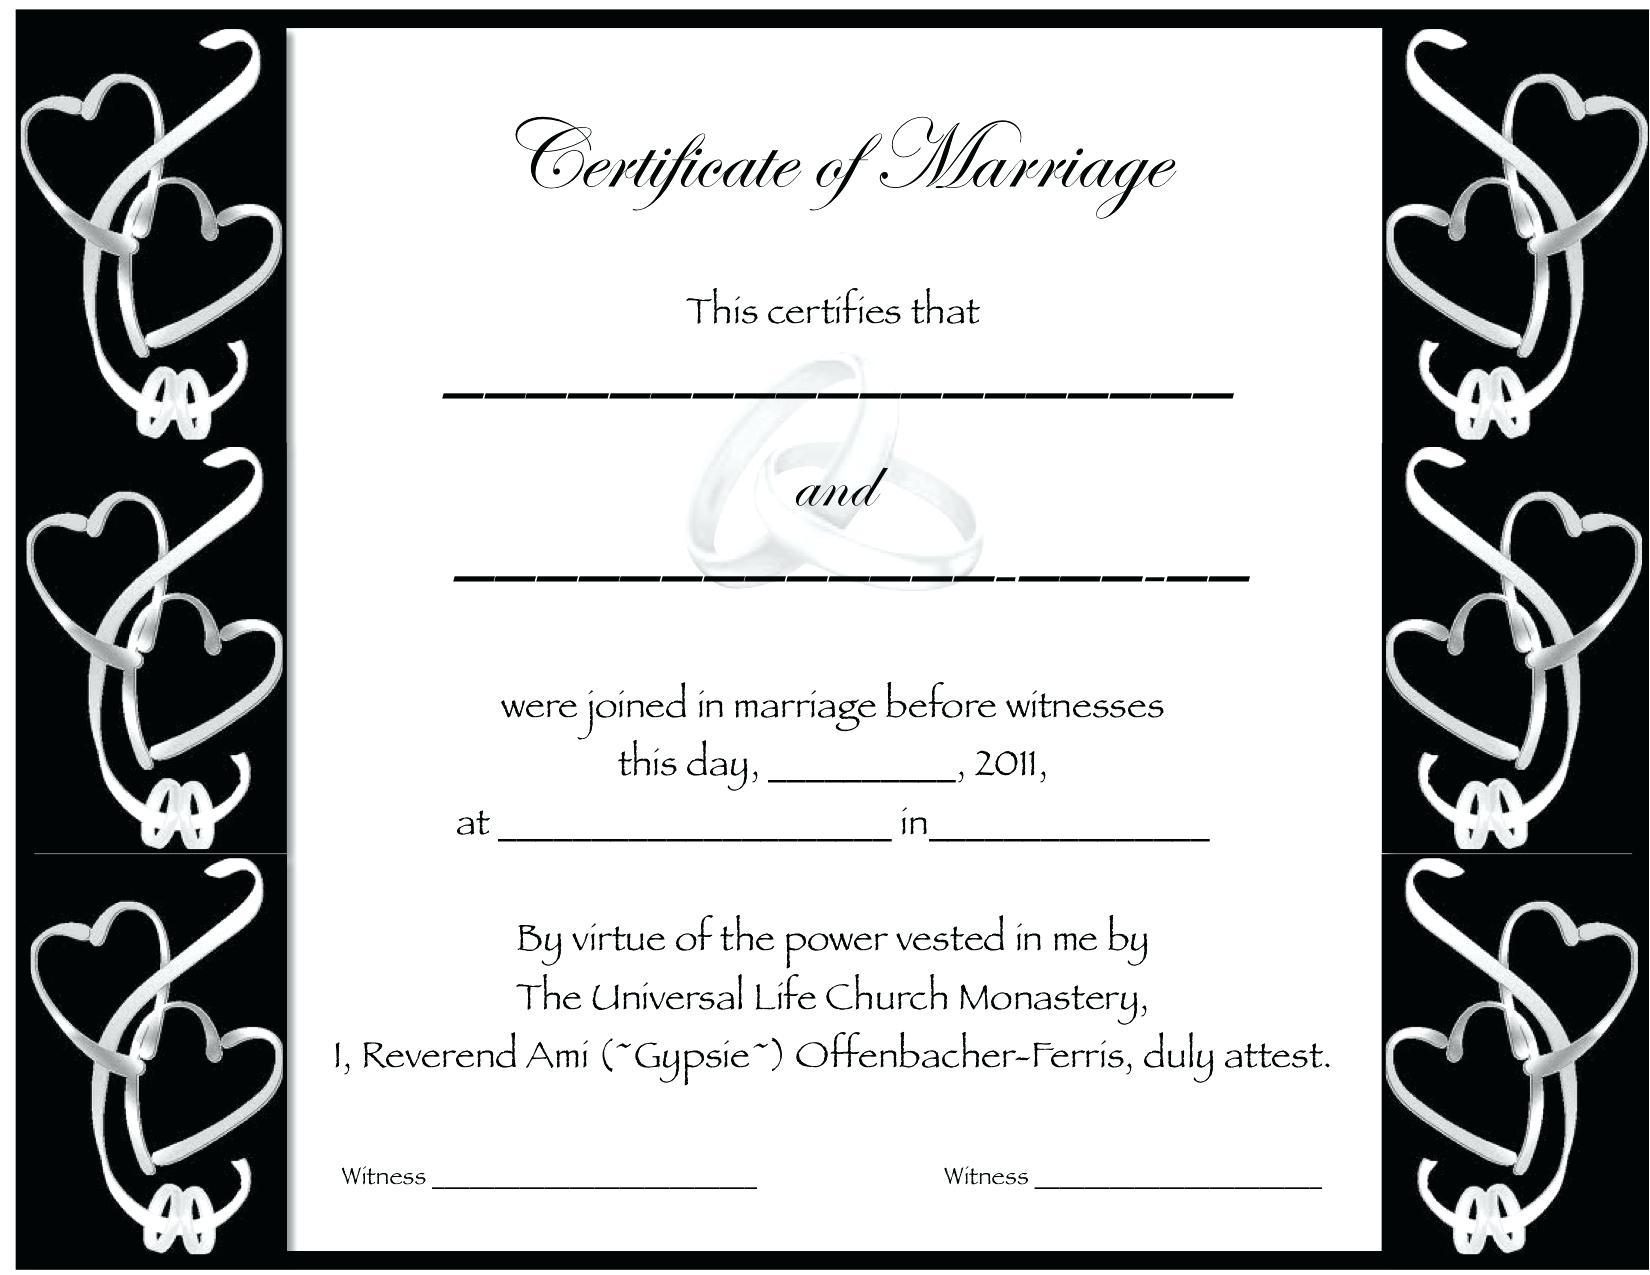 Certificate Fake Marriage Printable Filename | Elsik Blue Cetane - Fake Marriage Certificate Printable Free